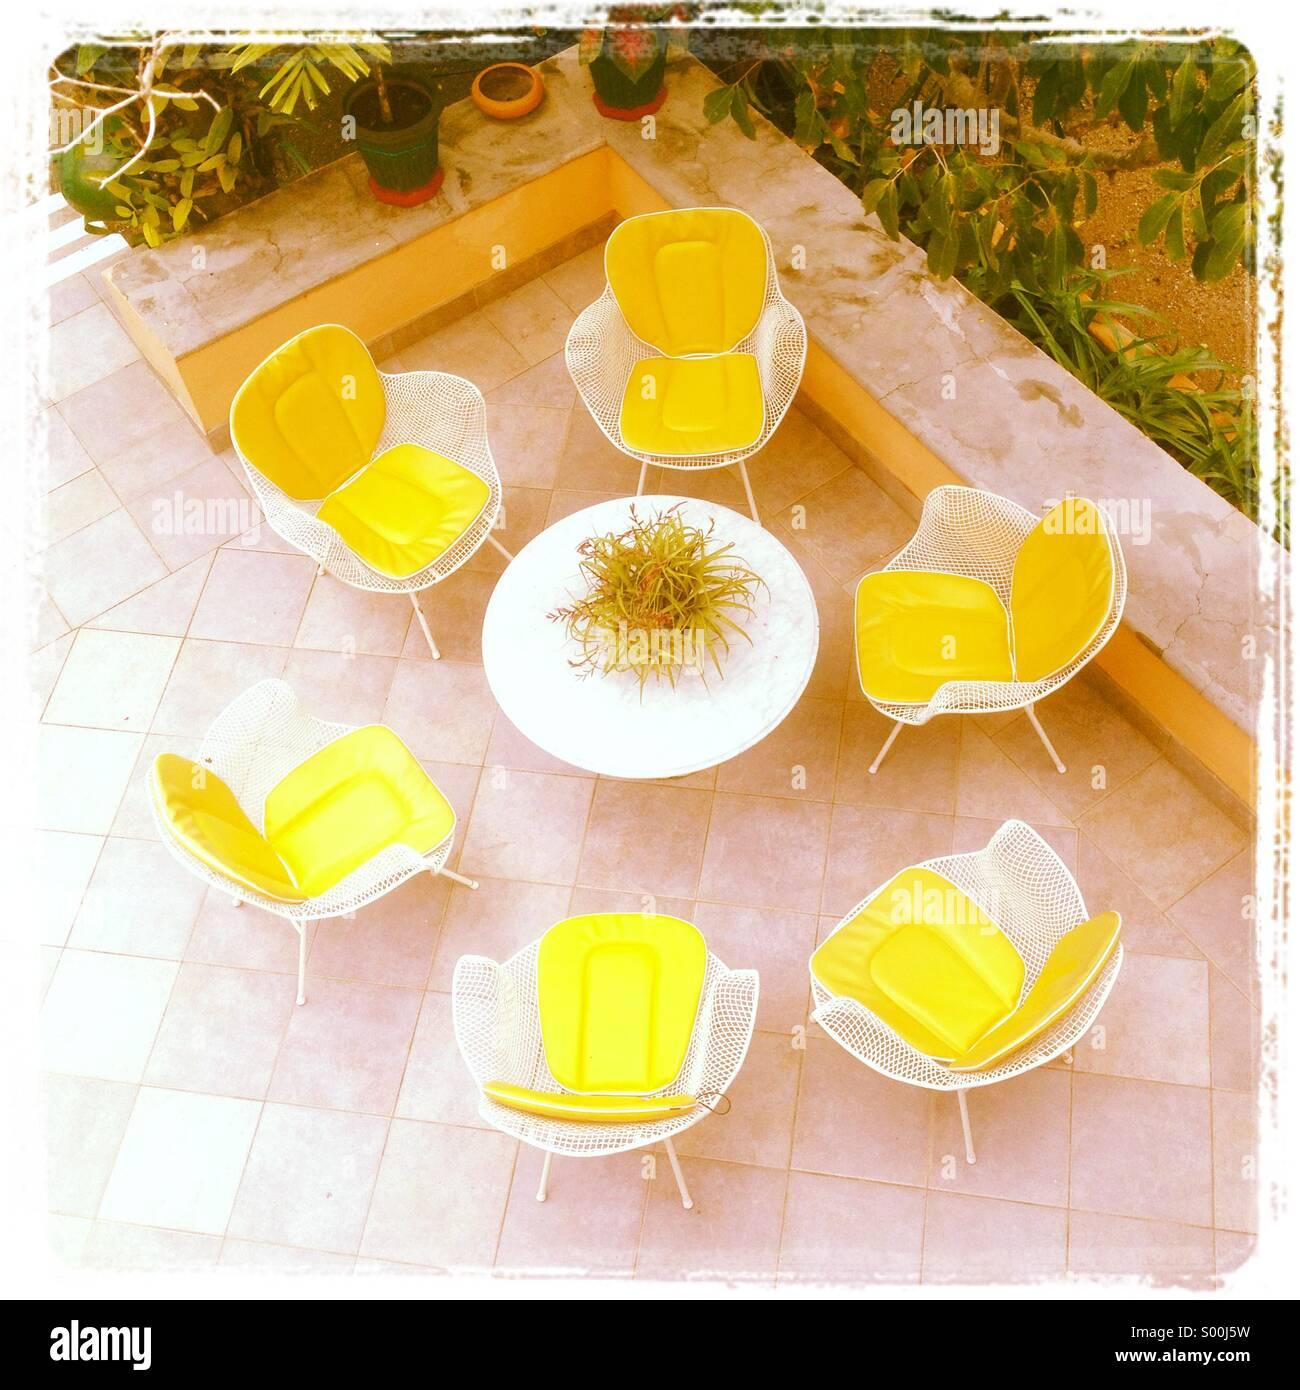 Cercle jaune Photo Stock